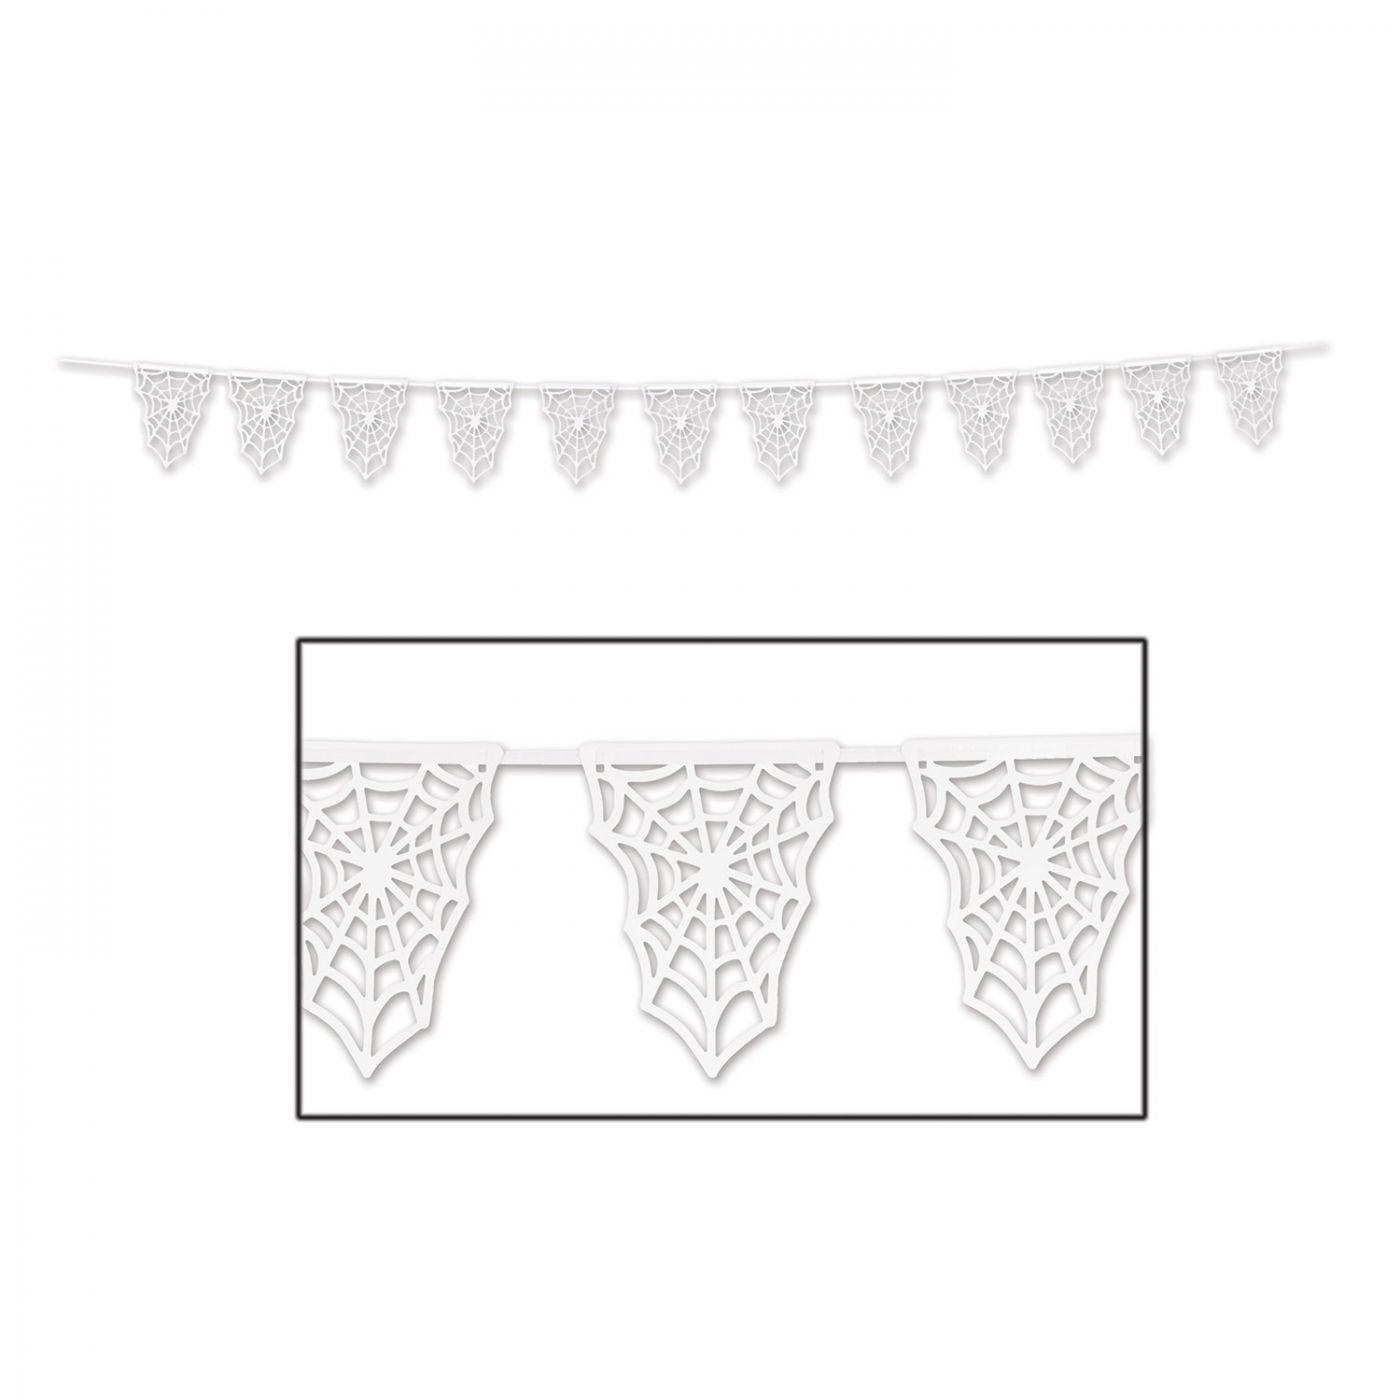 Die-Cut Spider Web Pennant Banner image